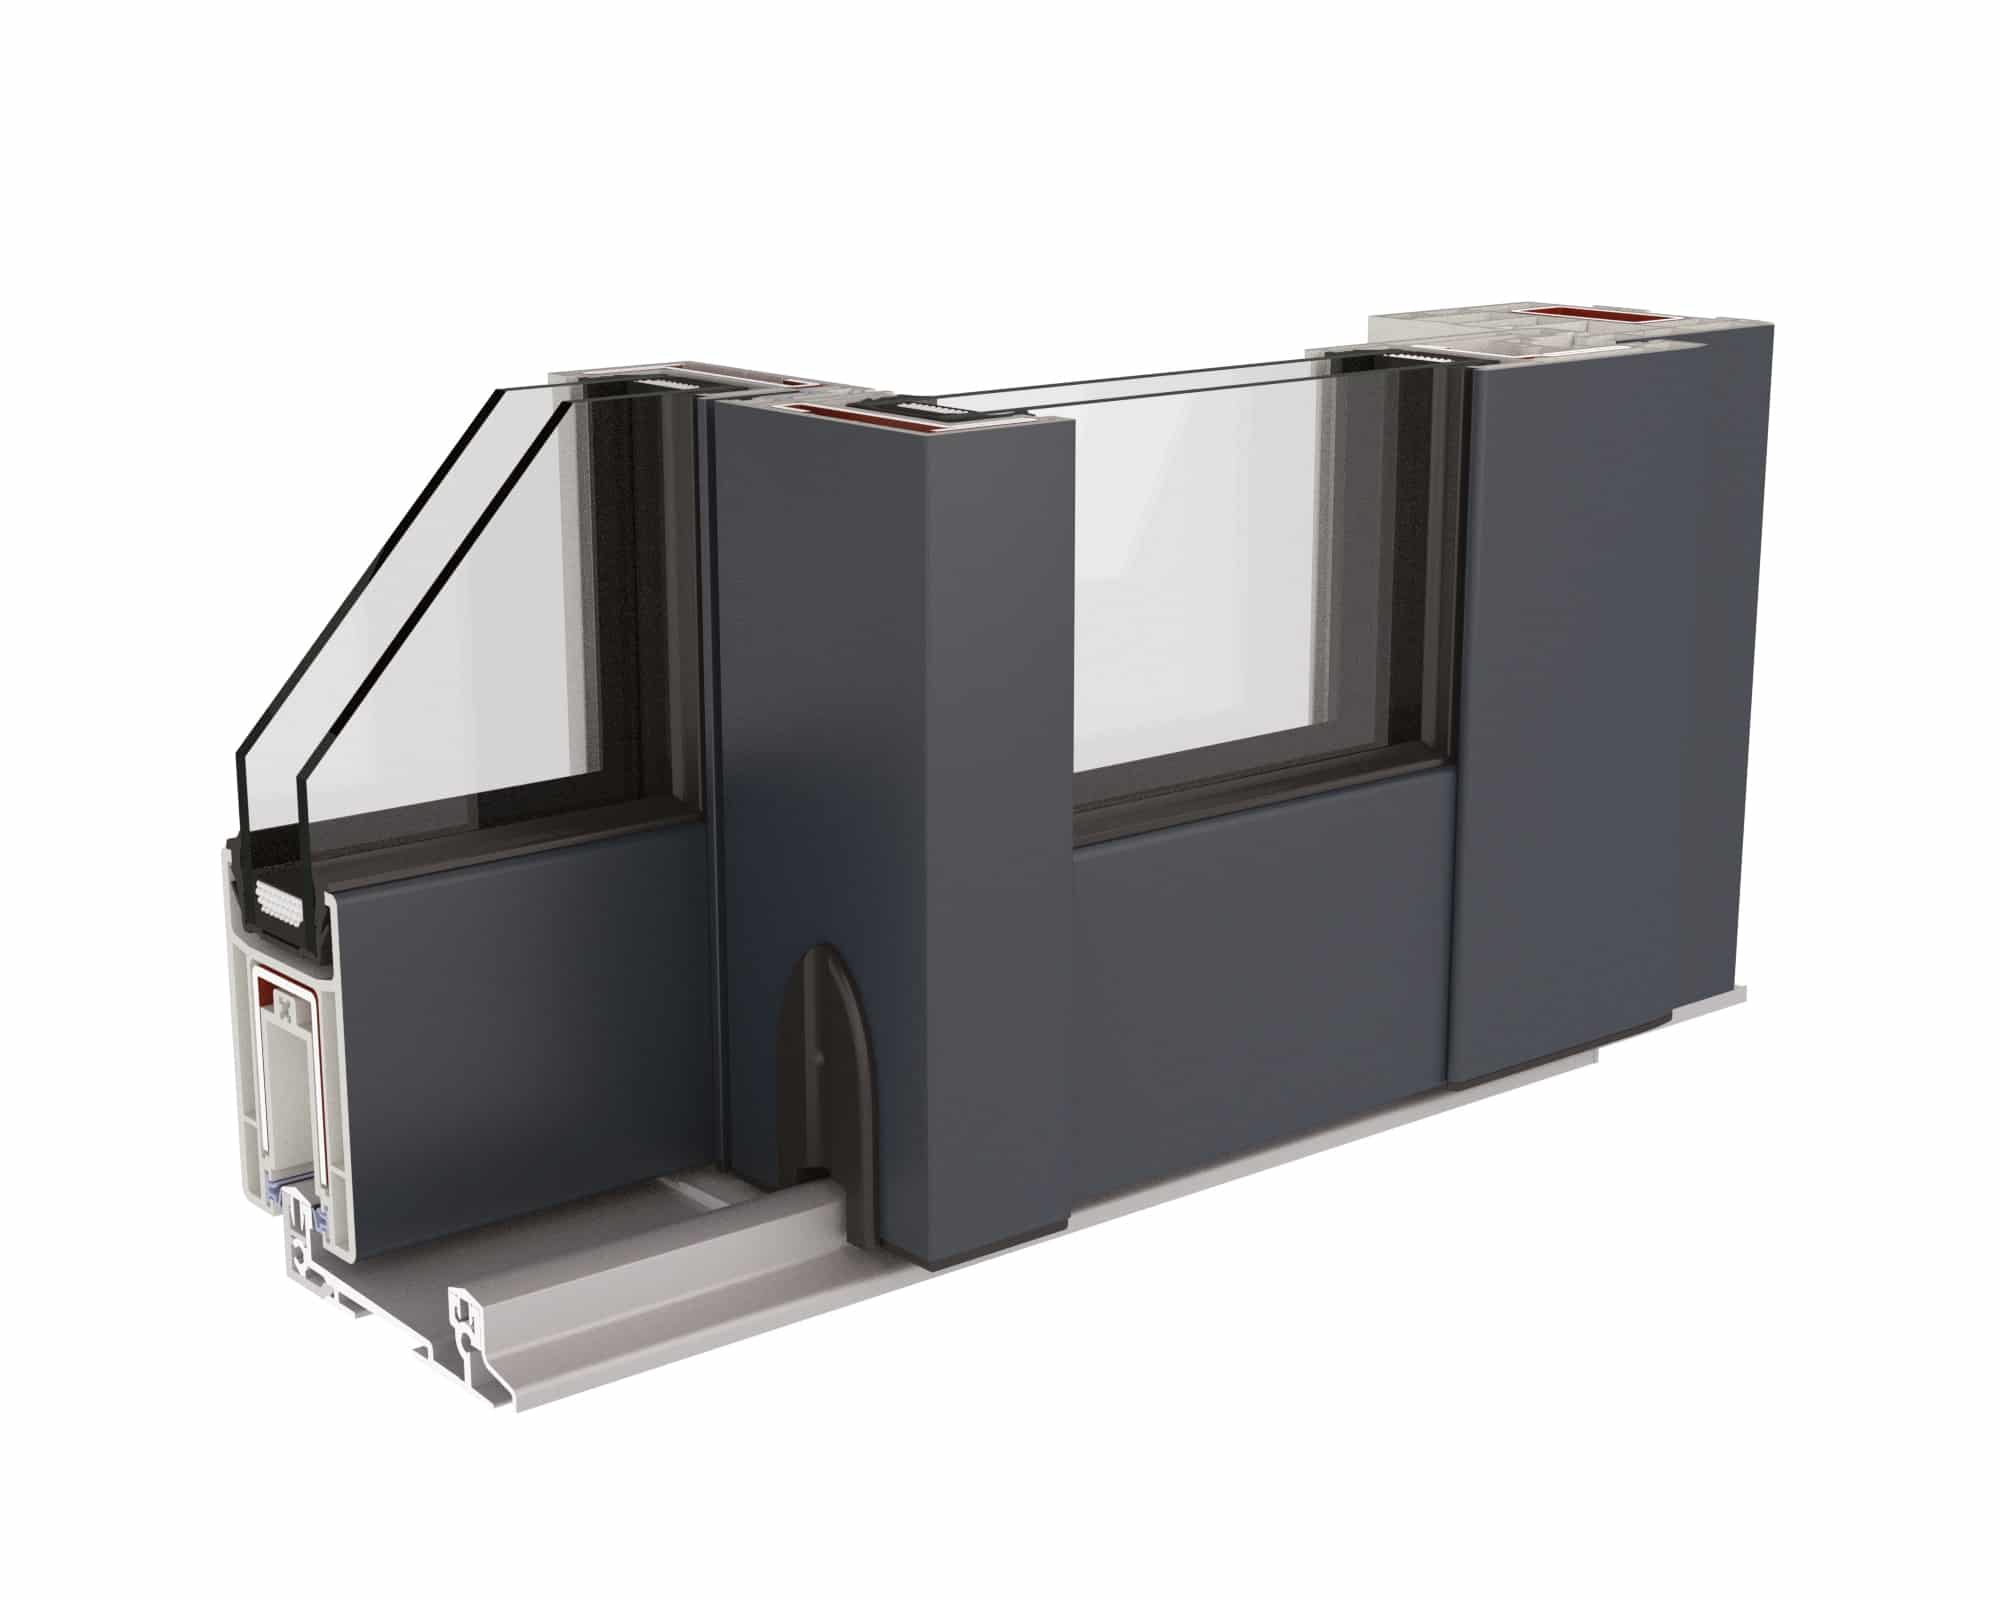 porte coulissante angle droit. Black Bedroom Furniture Sets. Home Design Ideas